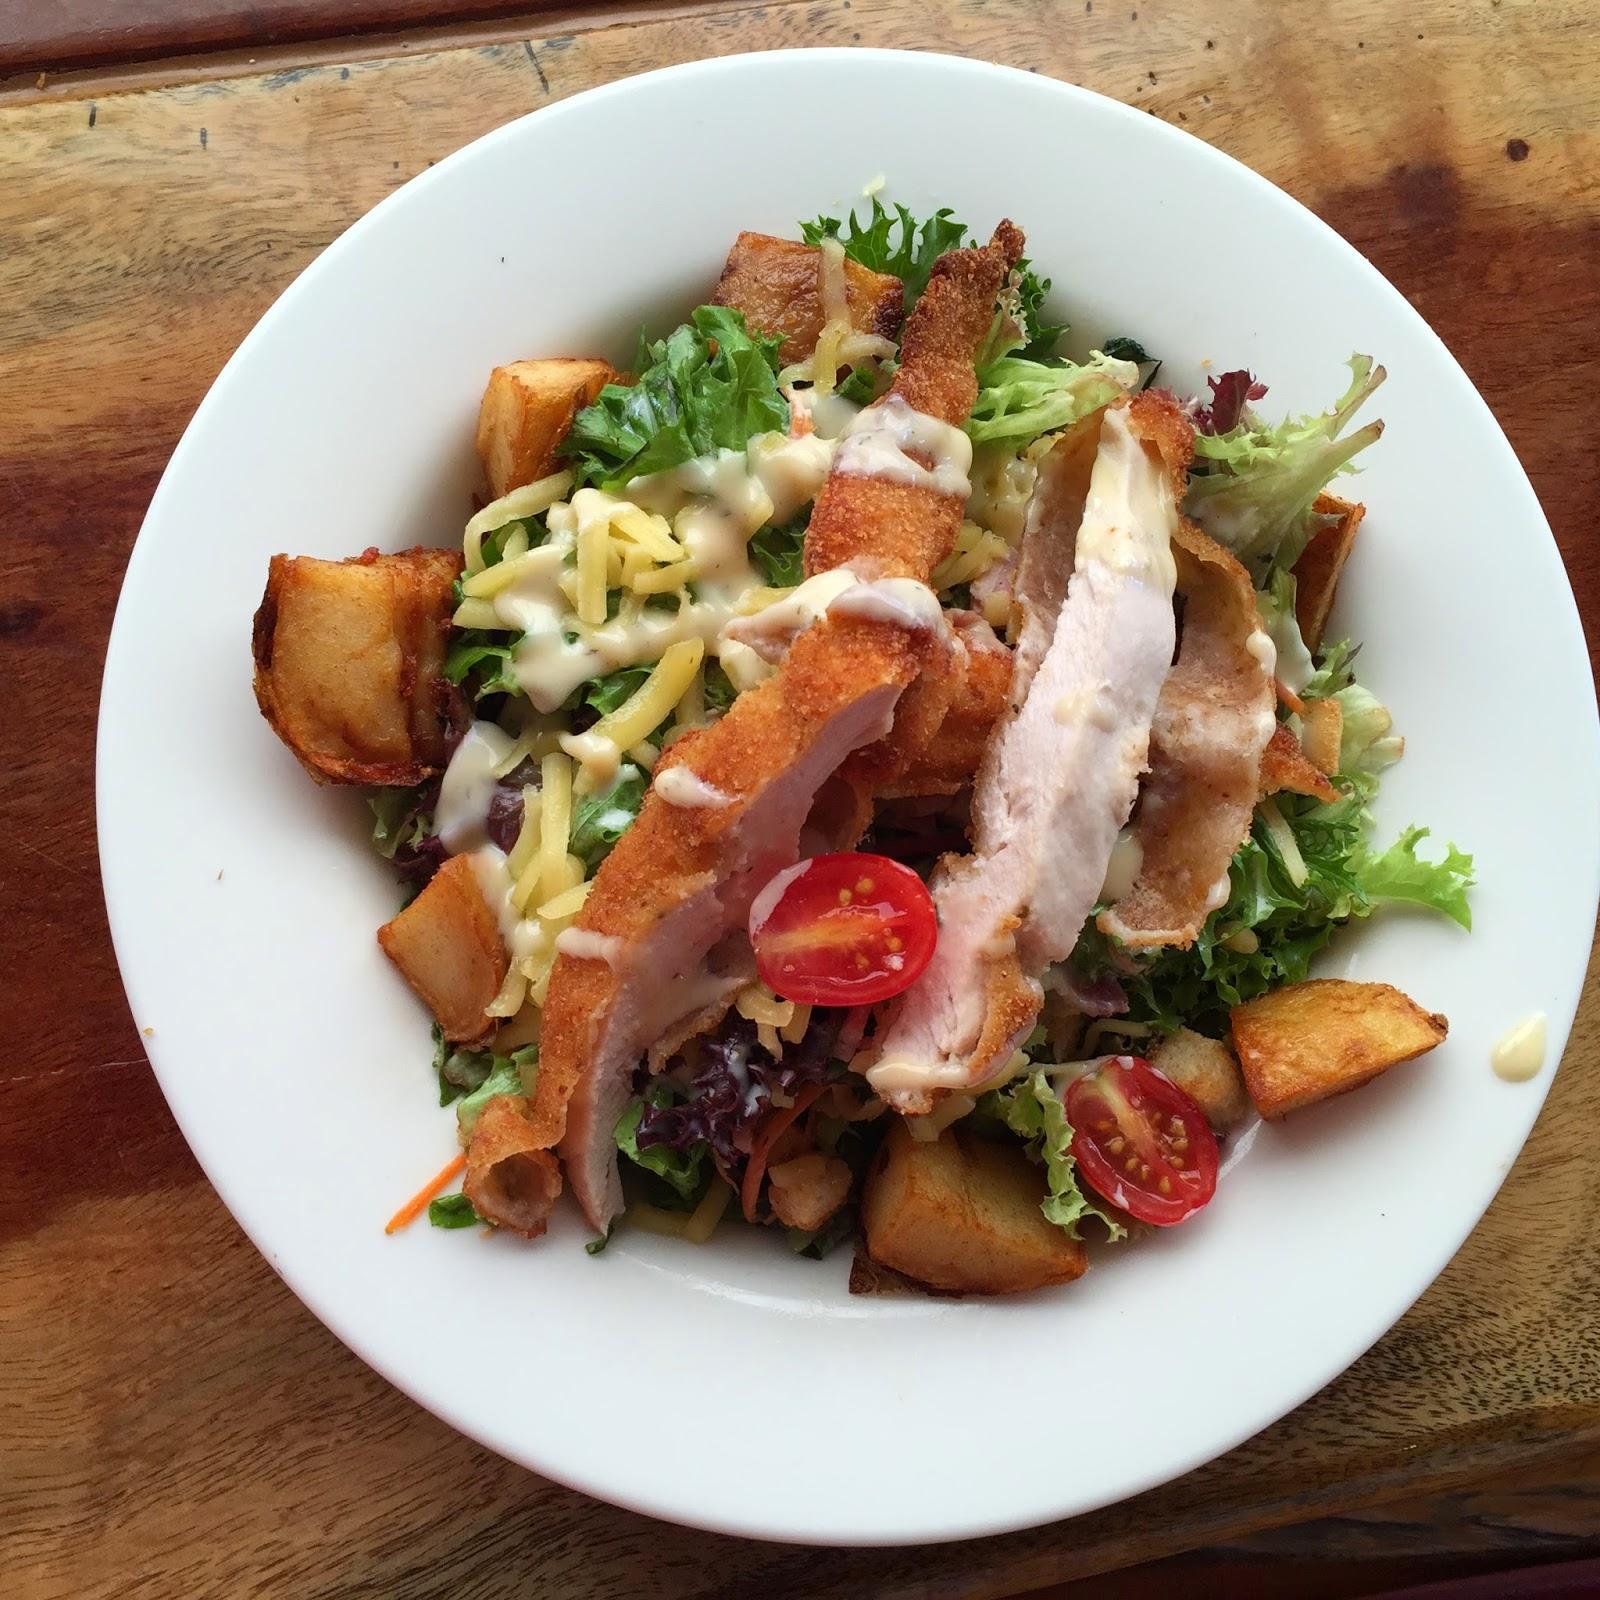 SFH Lunch at Cronulla Beach - Chicken Ranch Salad.